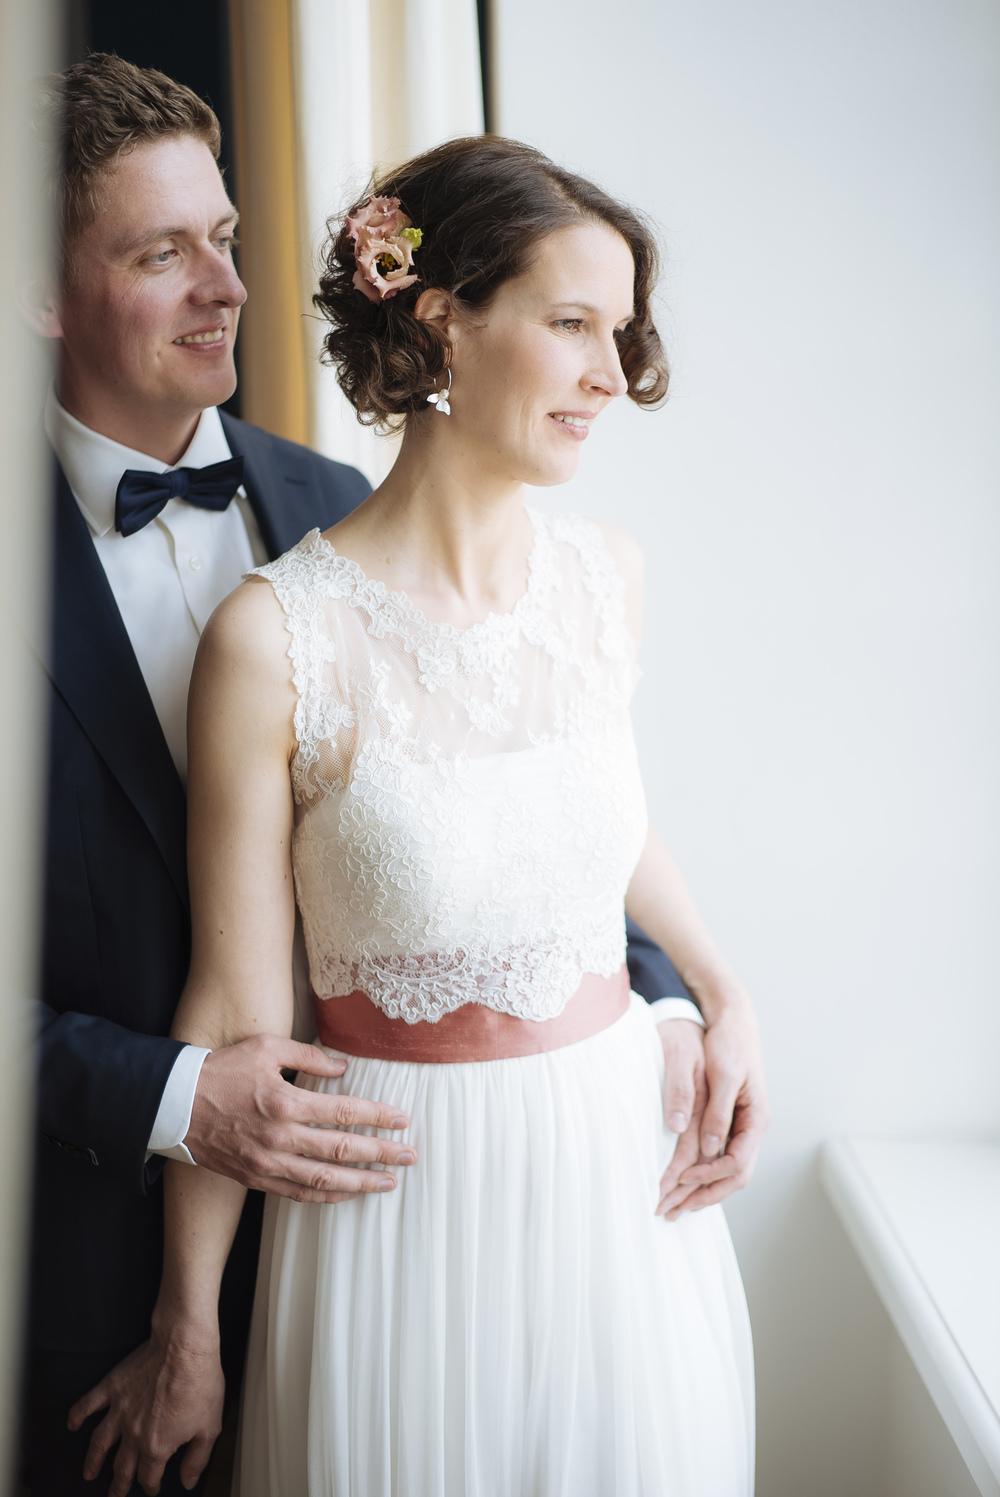 Hochzeitsfotograf-Schlossruine-Hertefeld-Weeze-014.jpg